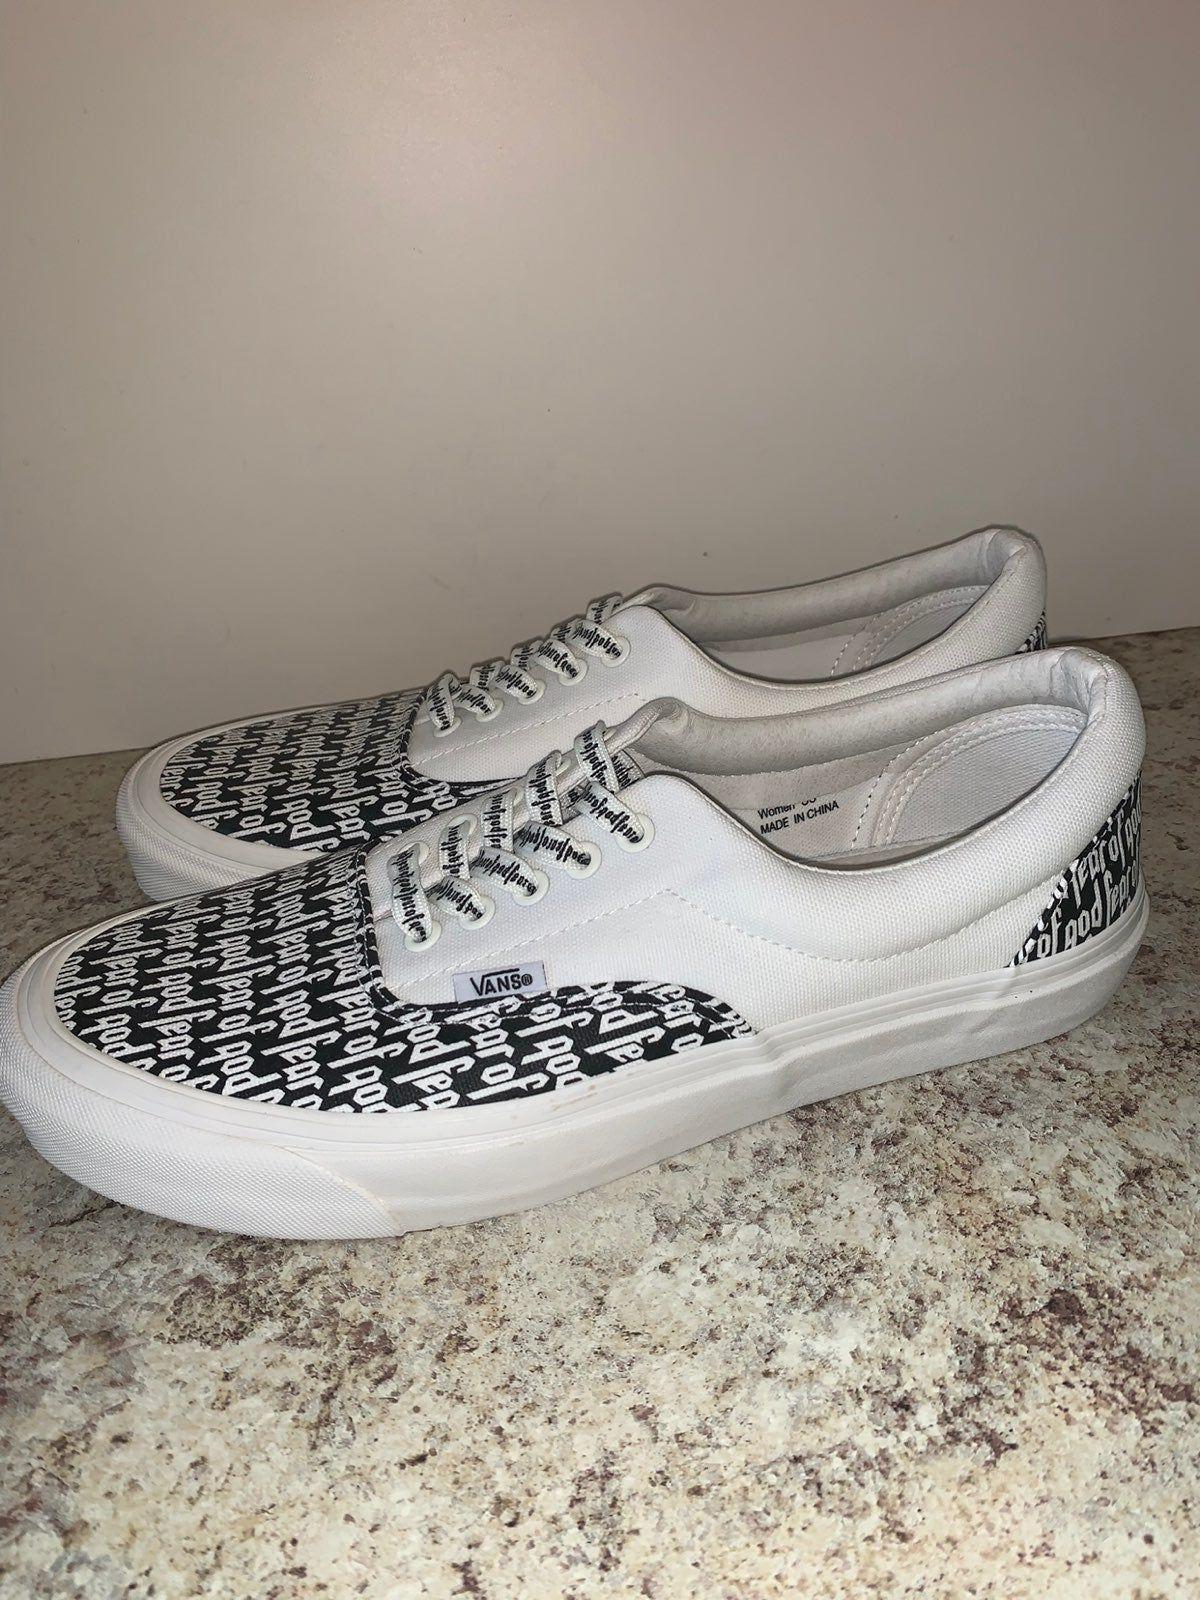 Deadstock Fear Of God Vans New With Box Size 11 Vans Shoes Mens Vans Authentic Sneaker